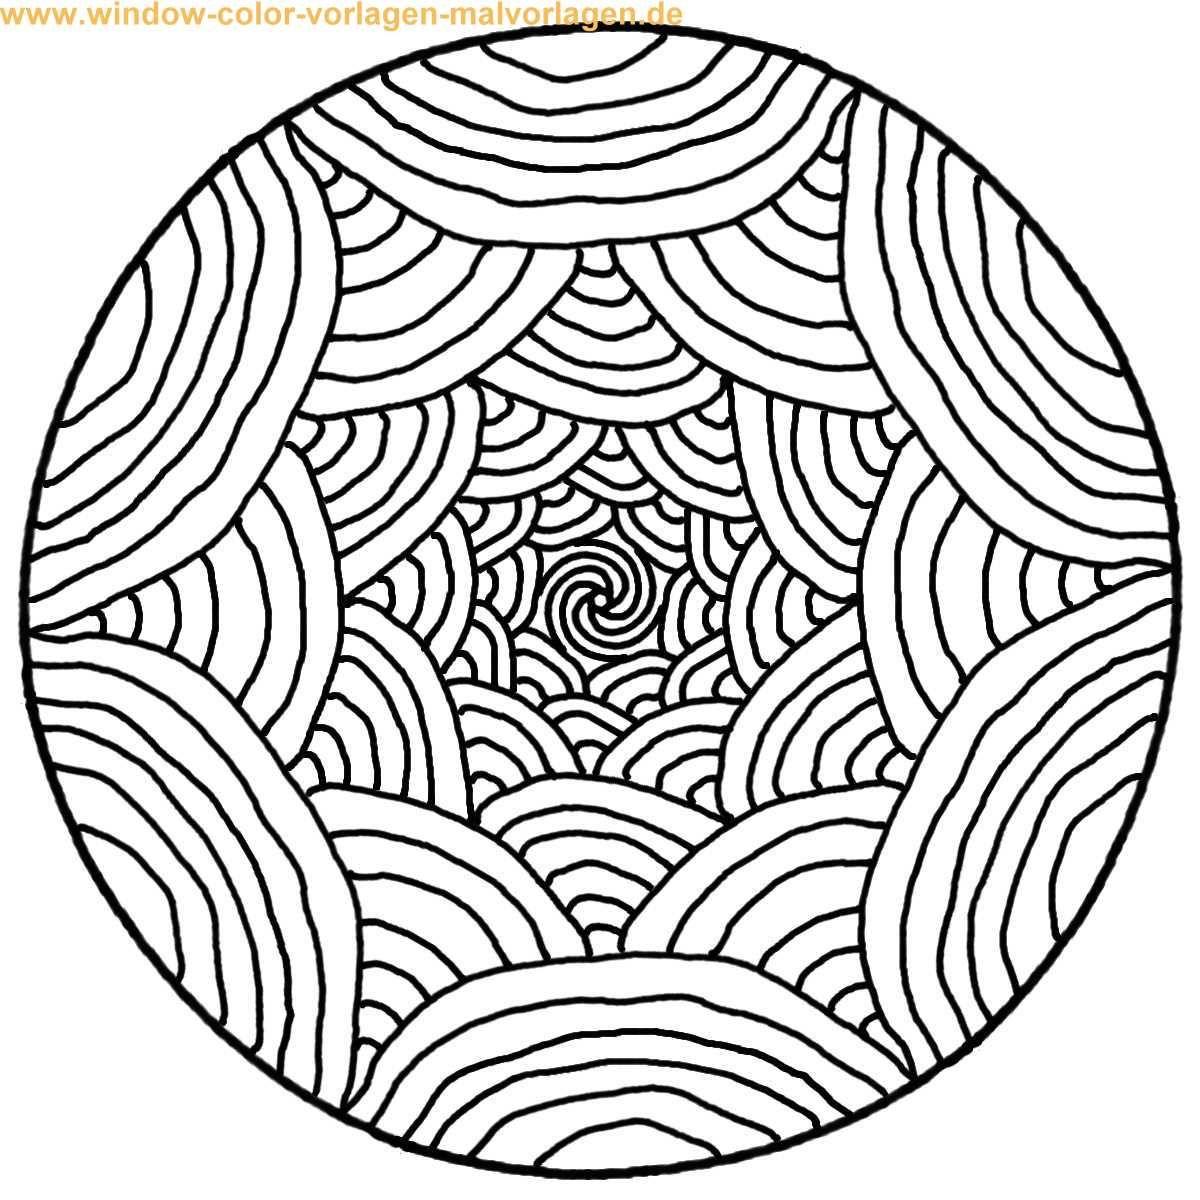 Mandalas To Print And Color | Malvorlage | Ausmalbild bei Mandalas Zum Ausmalen